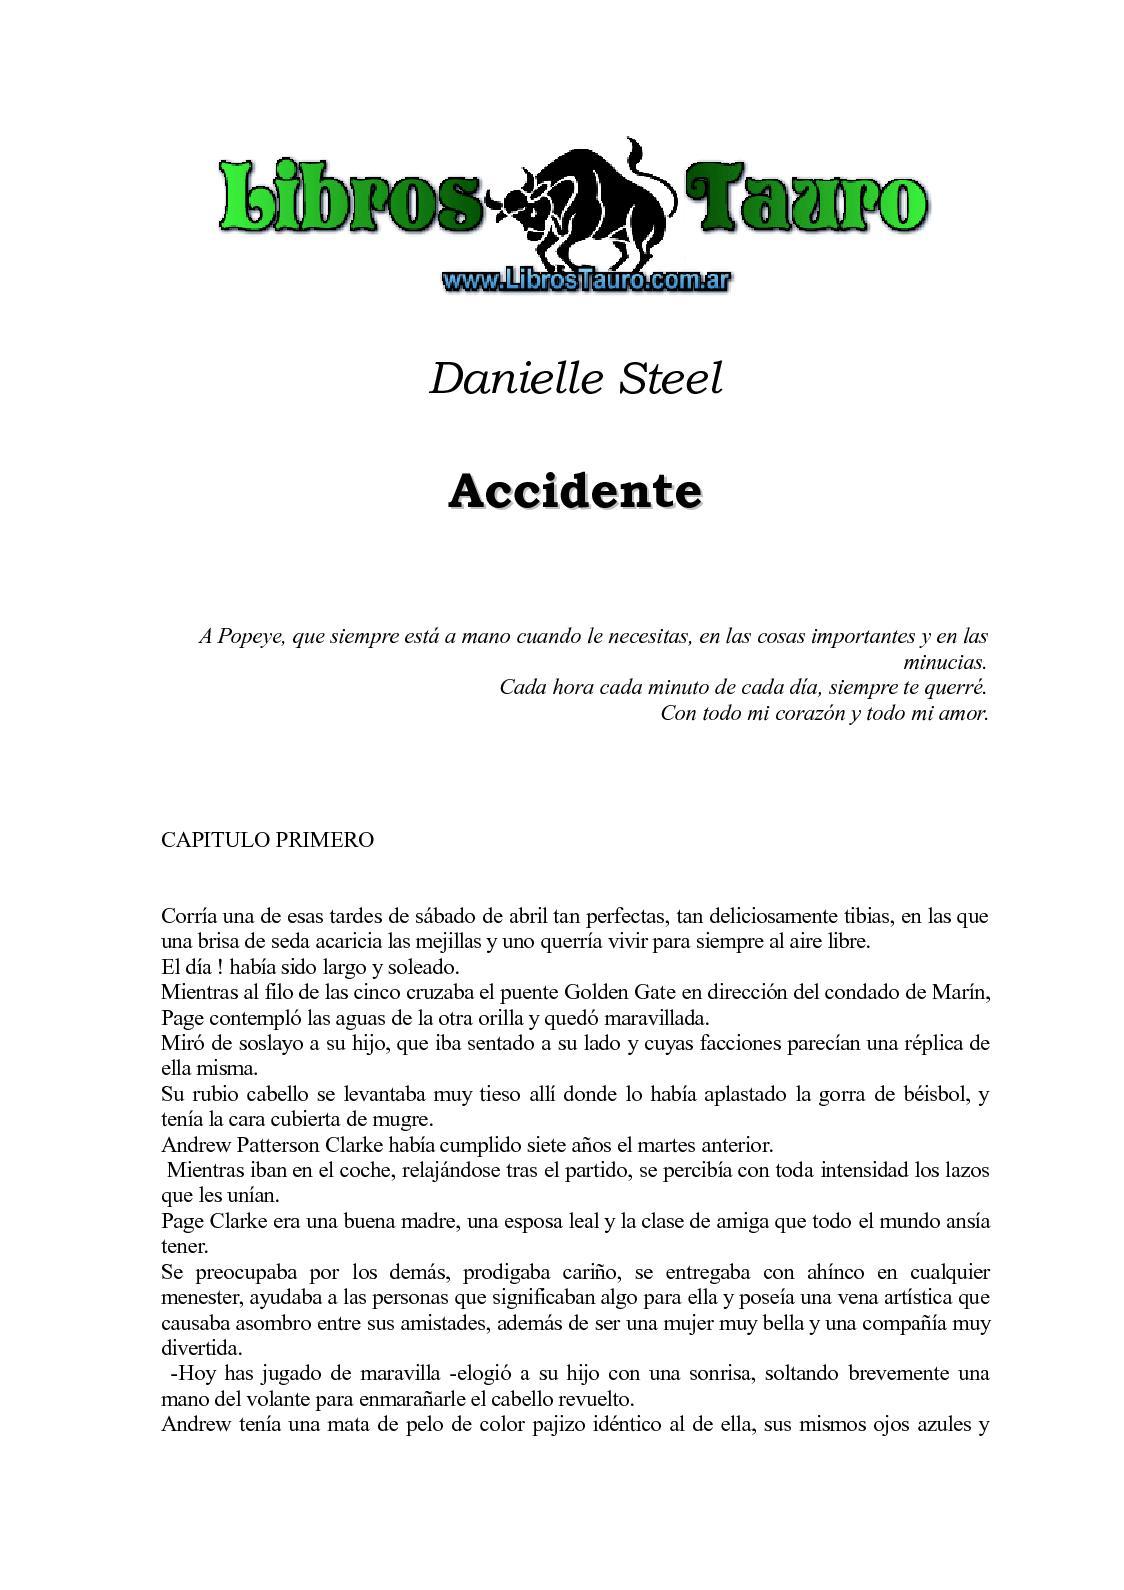 Calaméo - Steel, Danielle - Accidente